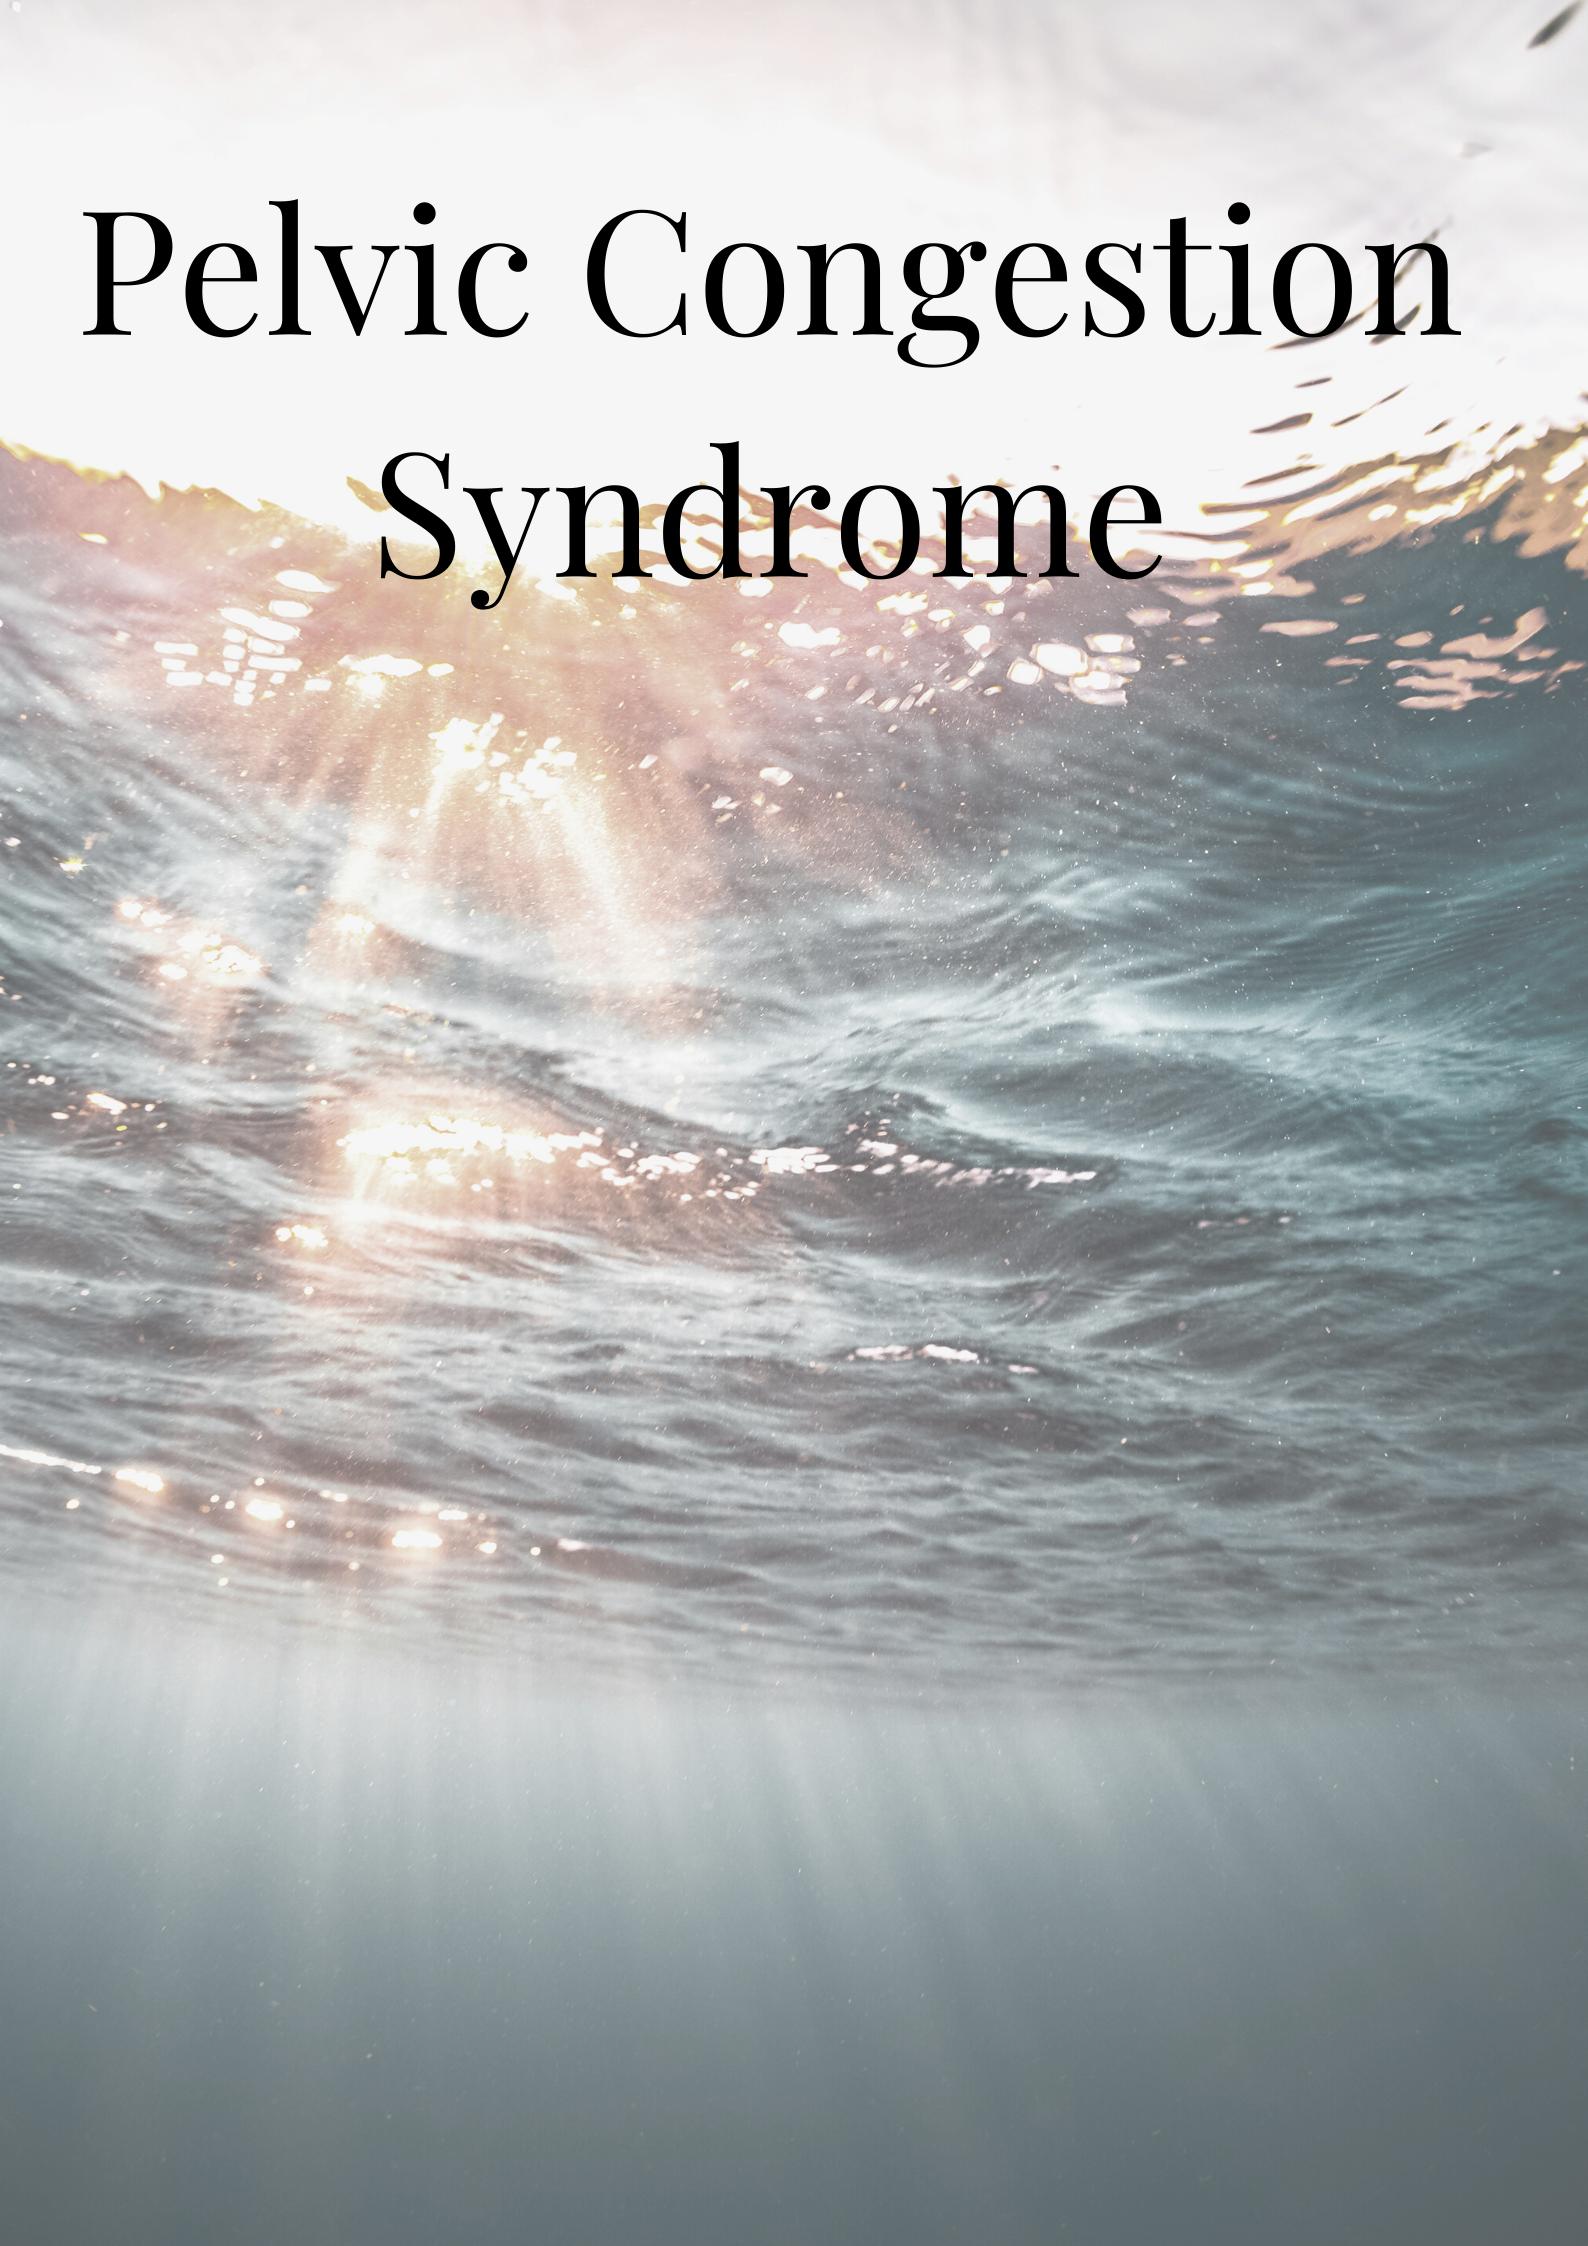 Pelvic Congestion Syndrome